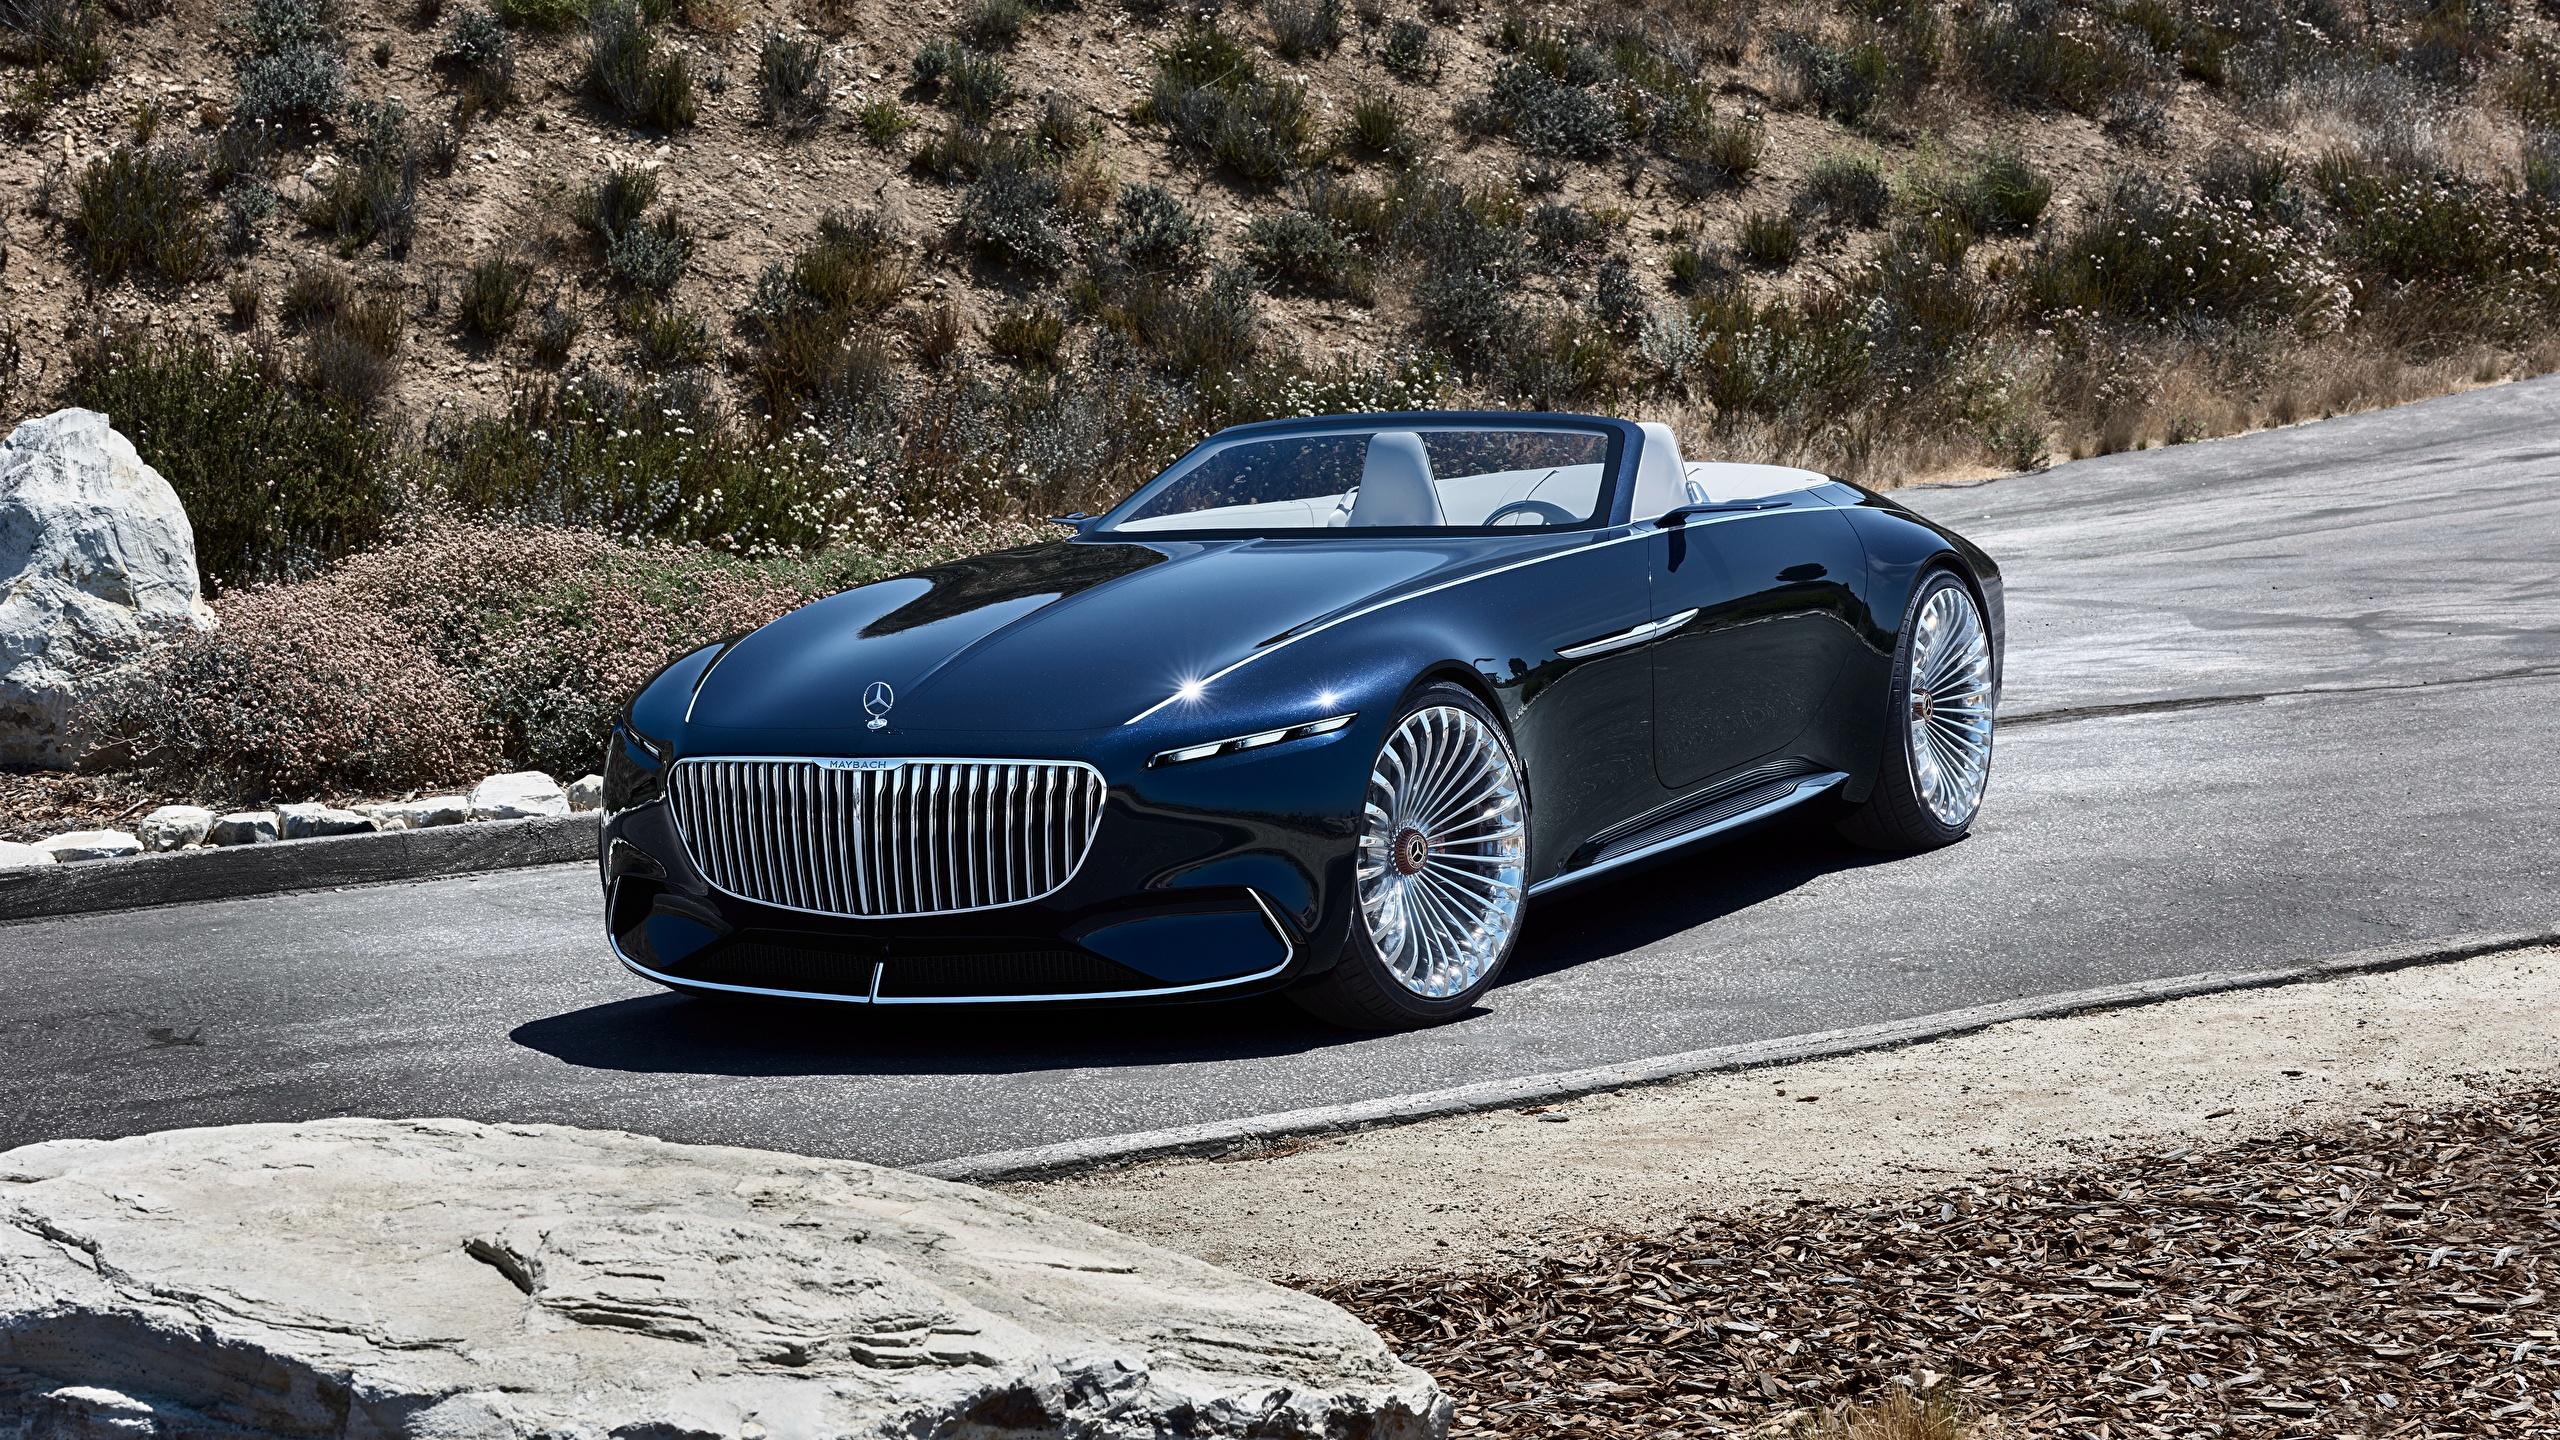 Fondos De Pantalla 2560x1440 Mercedes Benz 2017 Vision